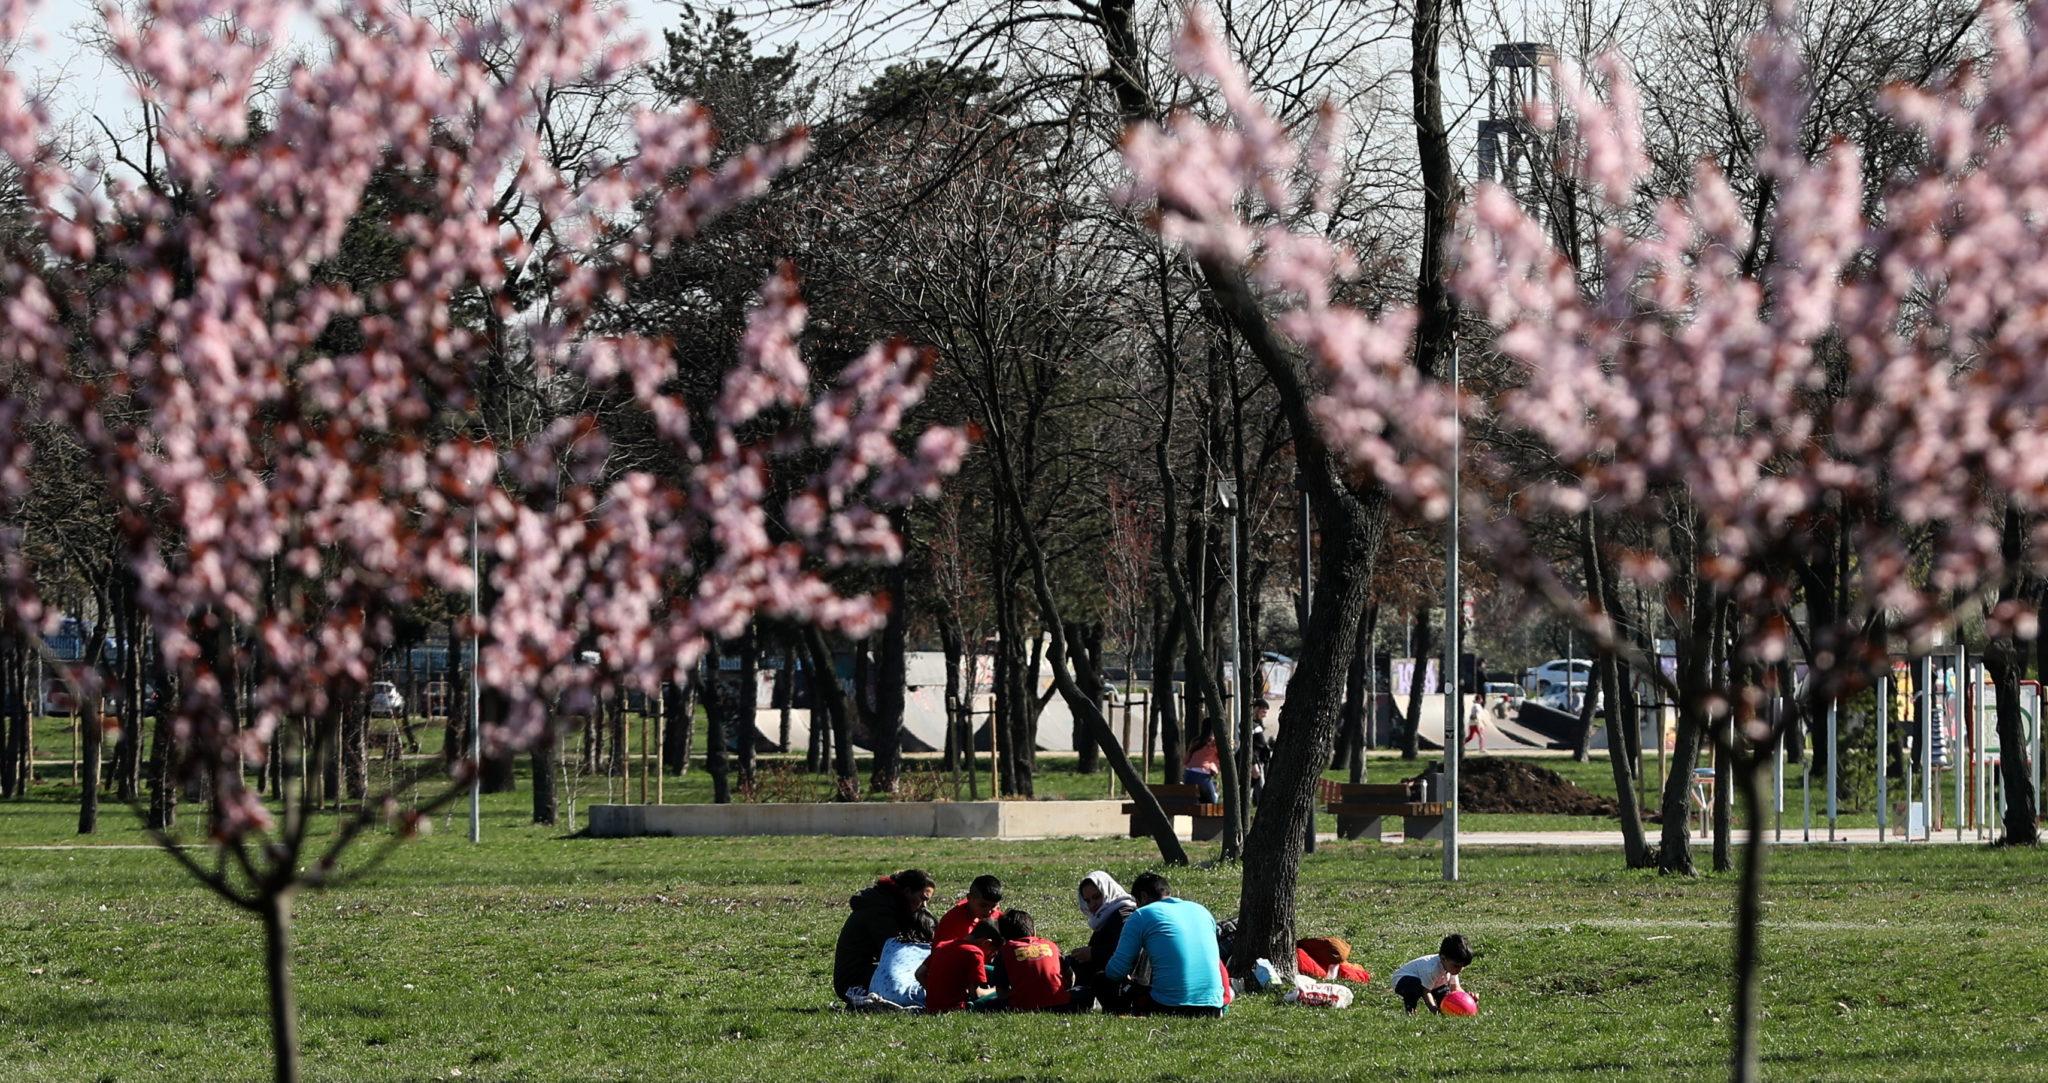 Belgrad, Serbia, fot. KOCA SULEJMANOVIC, PAP/EPA.